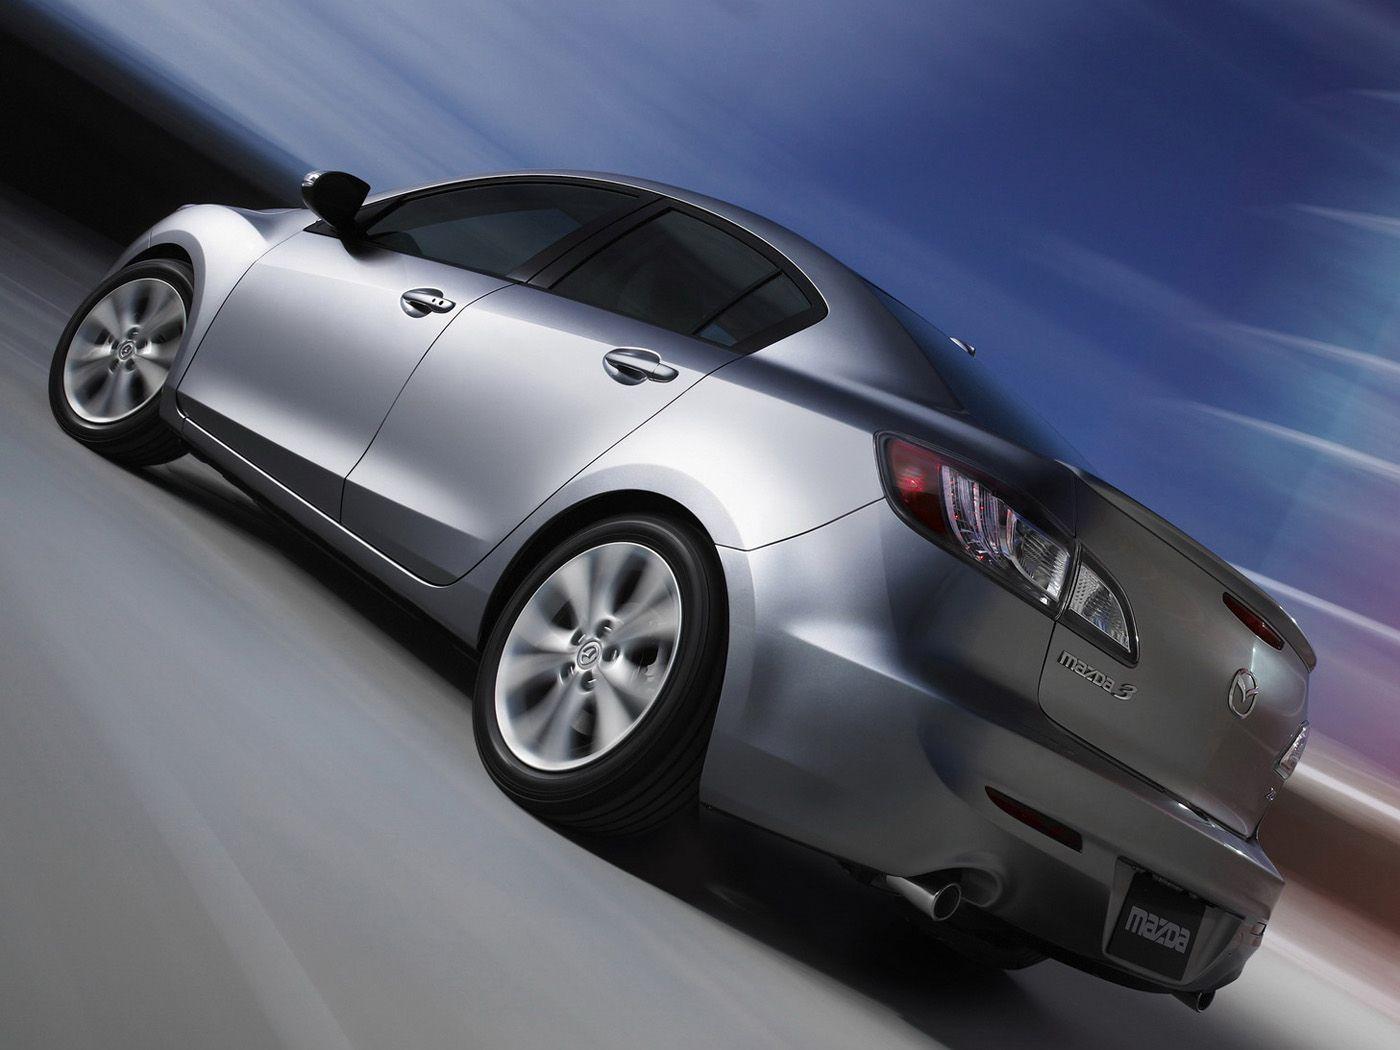 Mazda 3 2010 Sedan Side Rear Low Angle Wallpaper 1400x1050